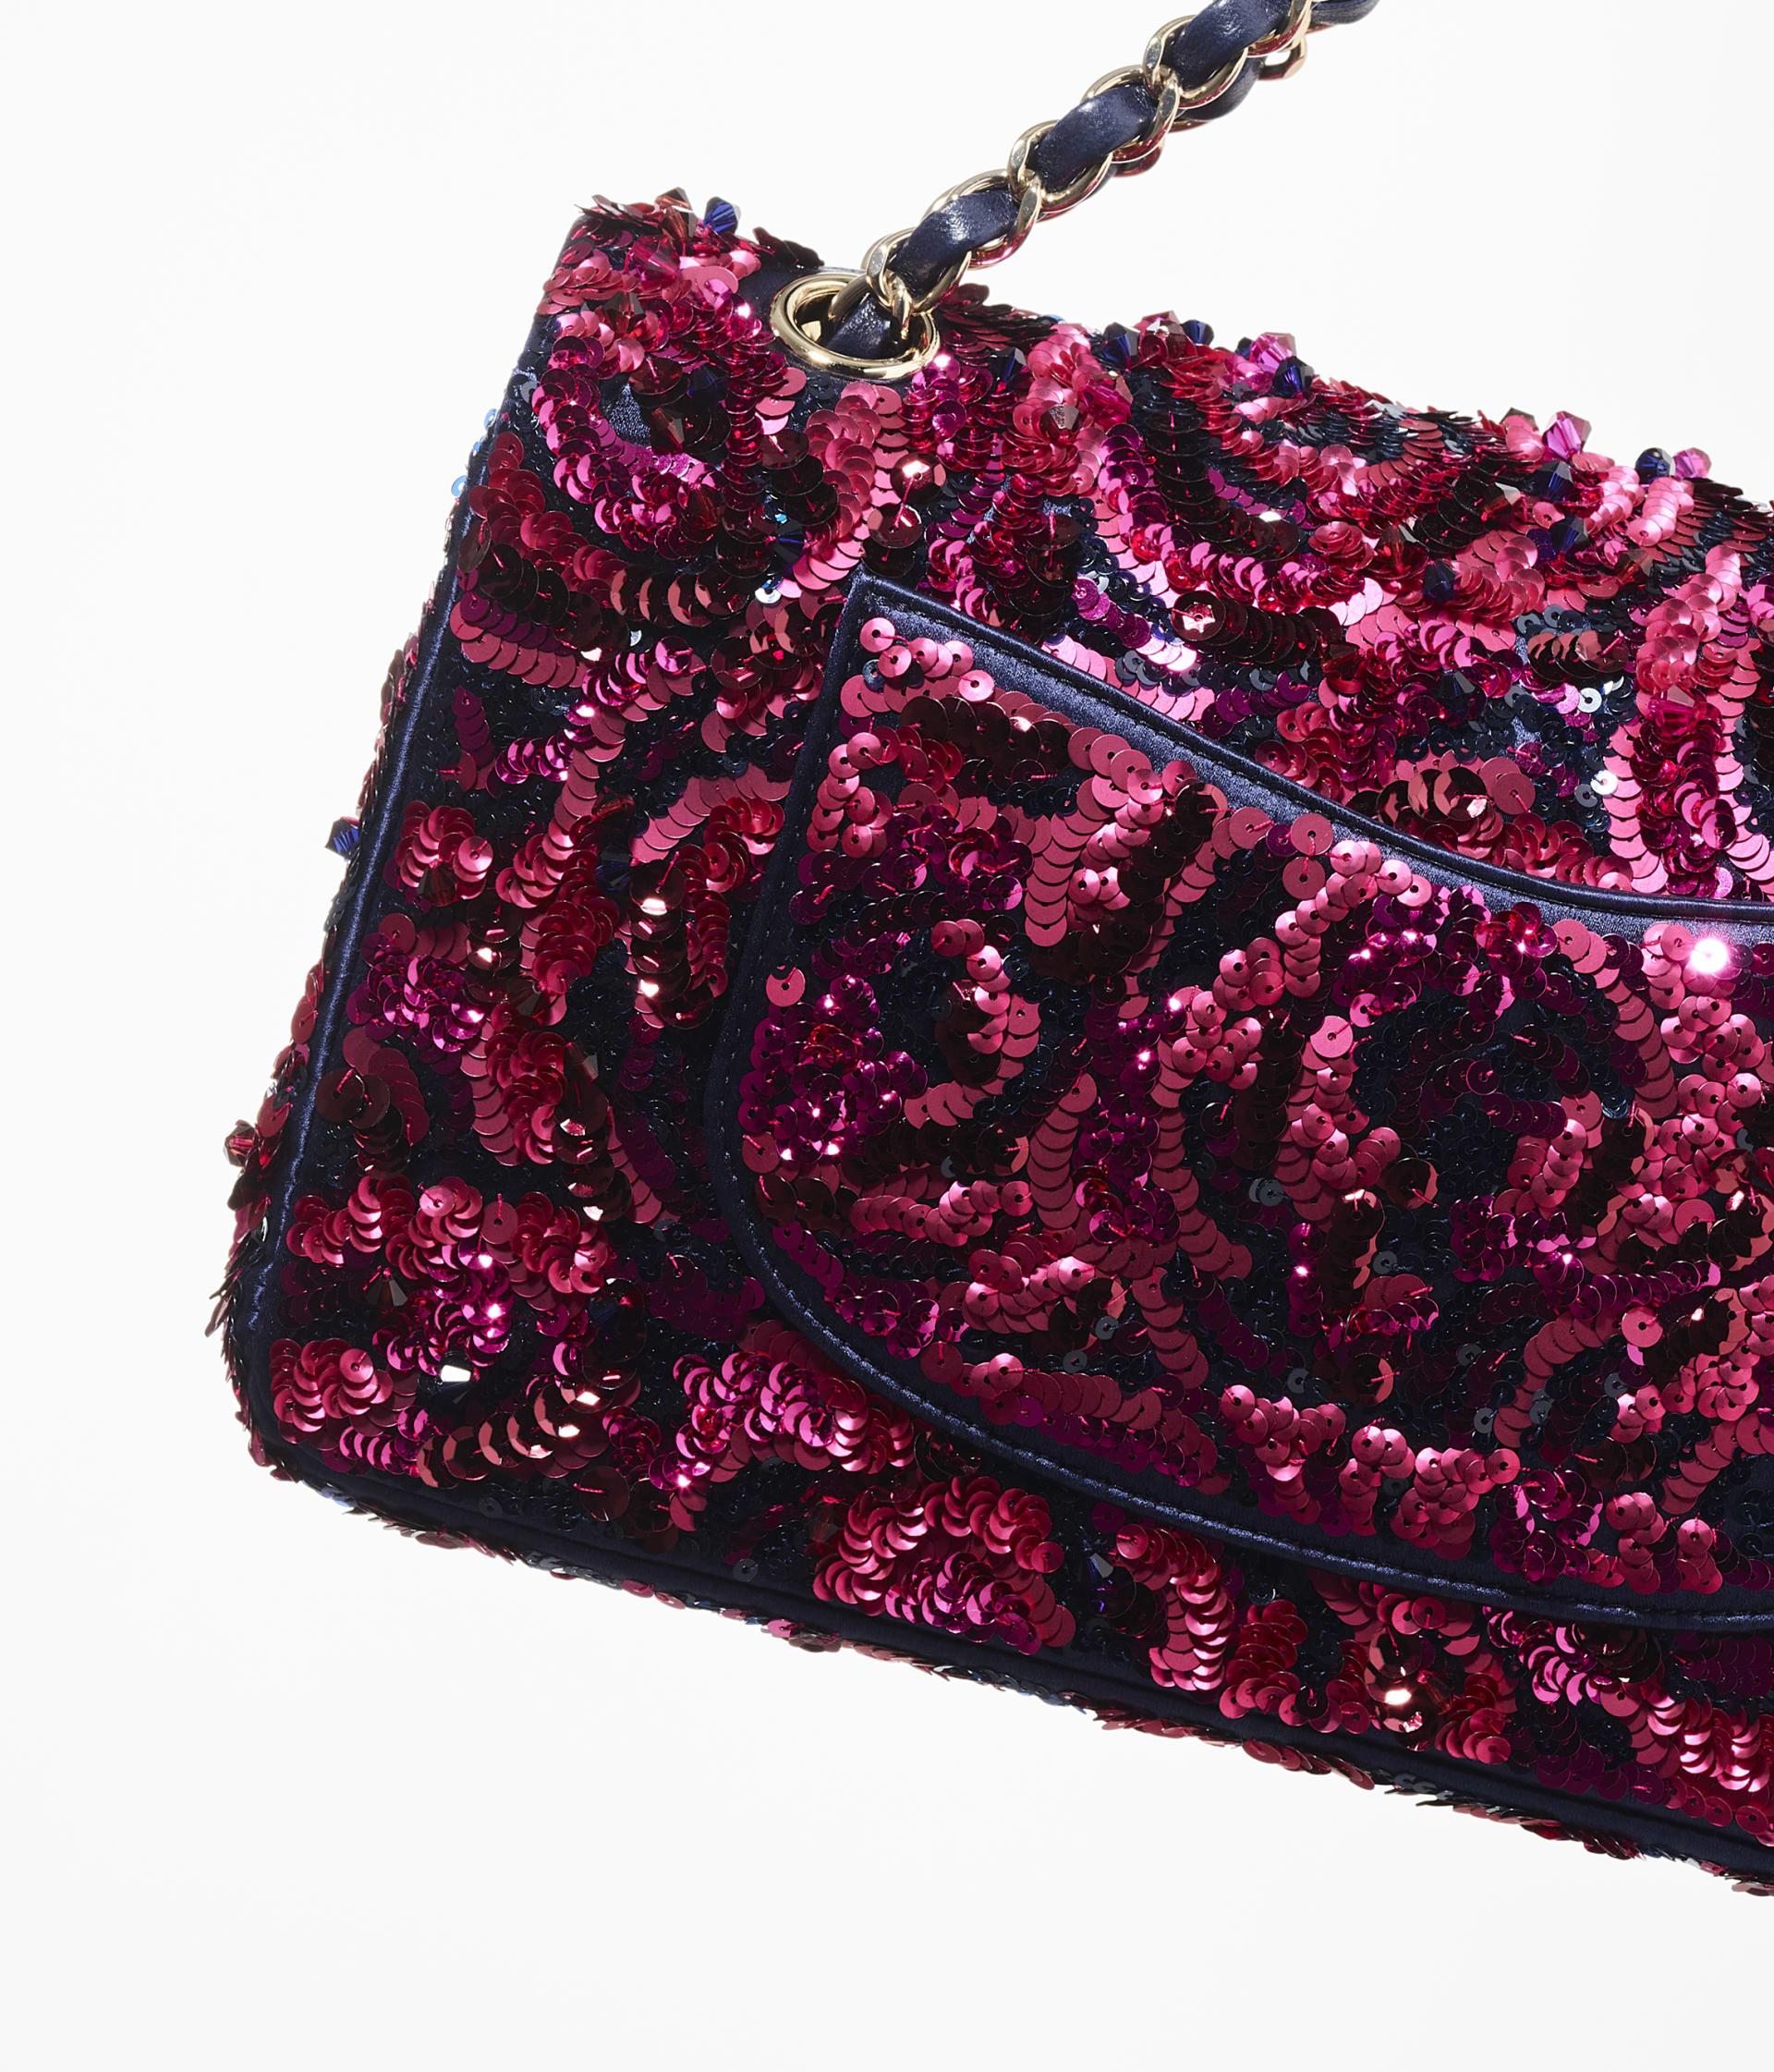 image 4 - Classic Handbag - Embroidered Satin, Sequins & Gold-Tone Metal - Pink & Navy Blue